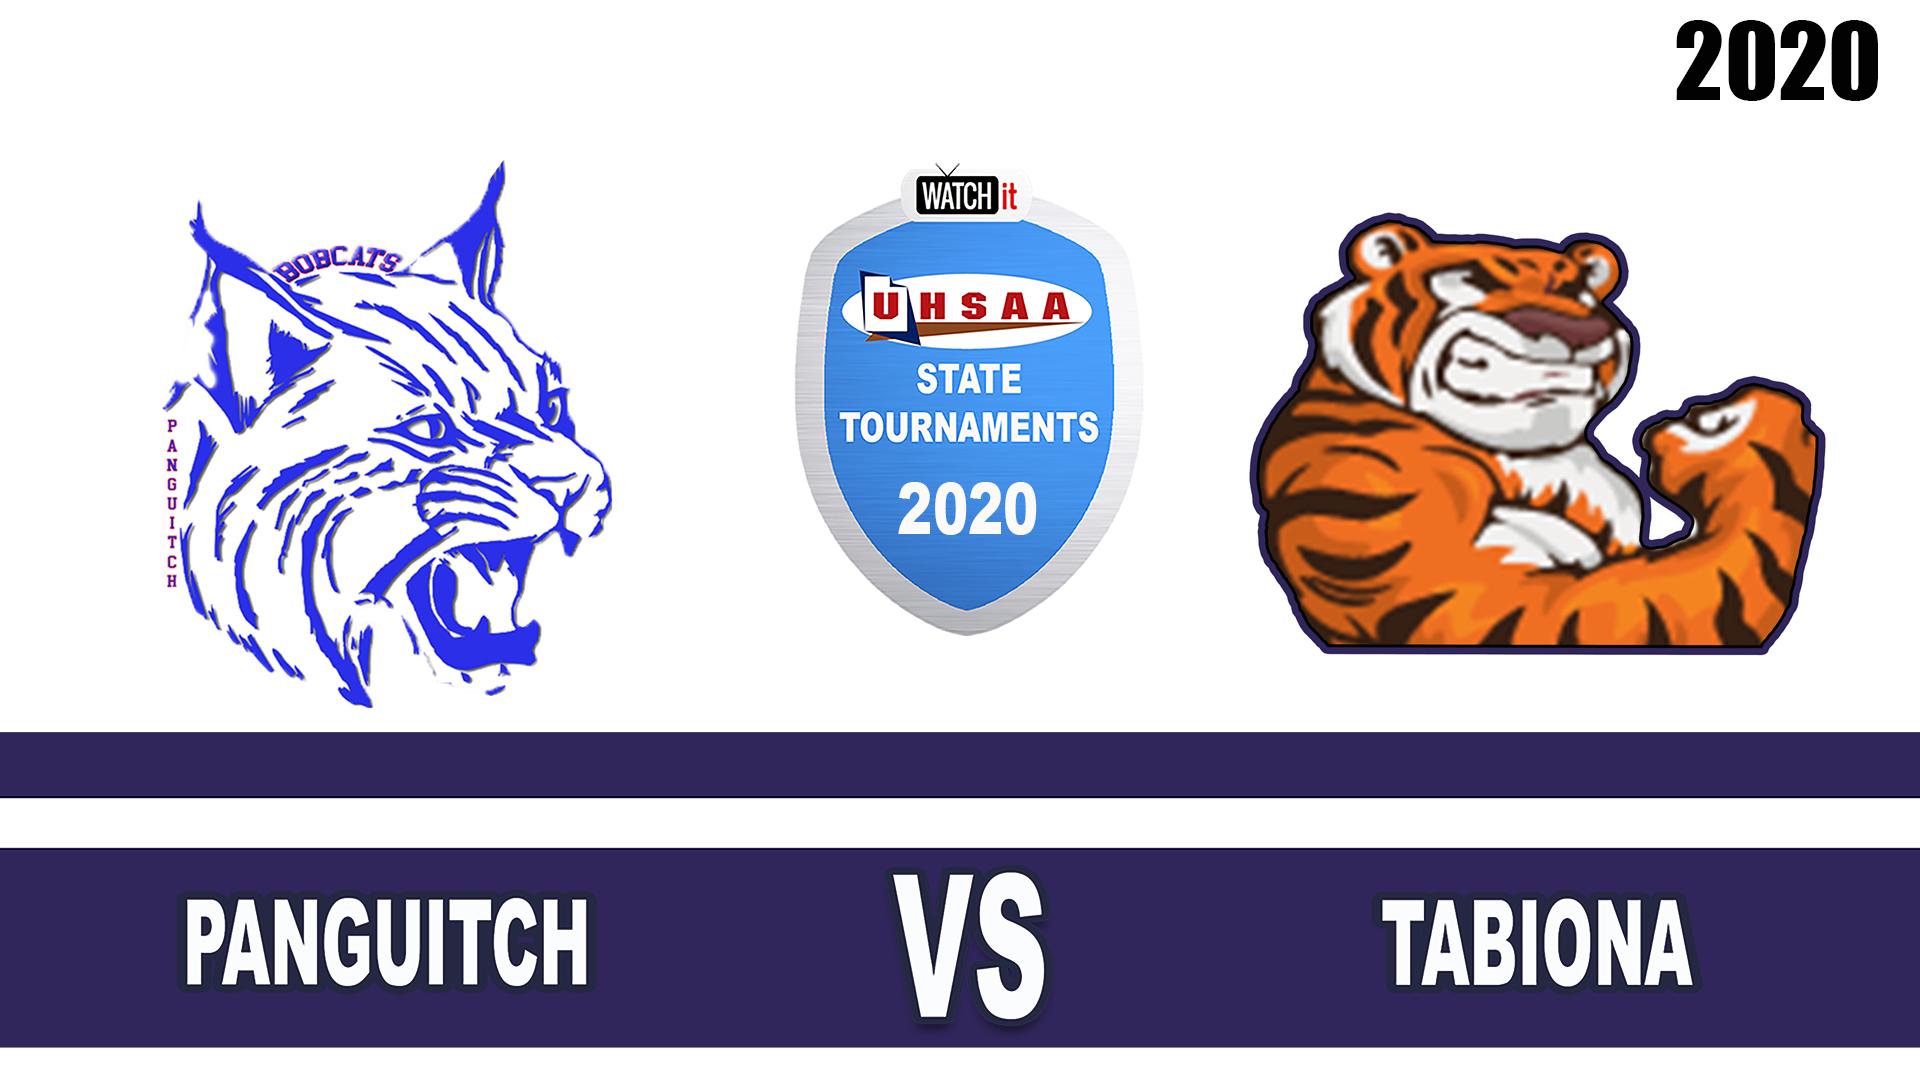 Panguitch vs Tabiona